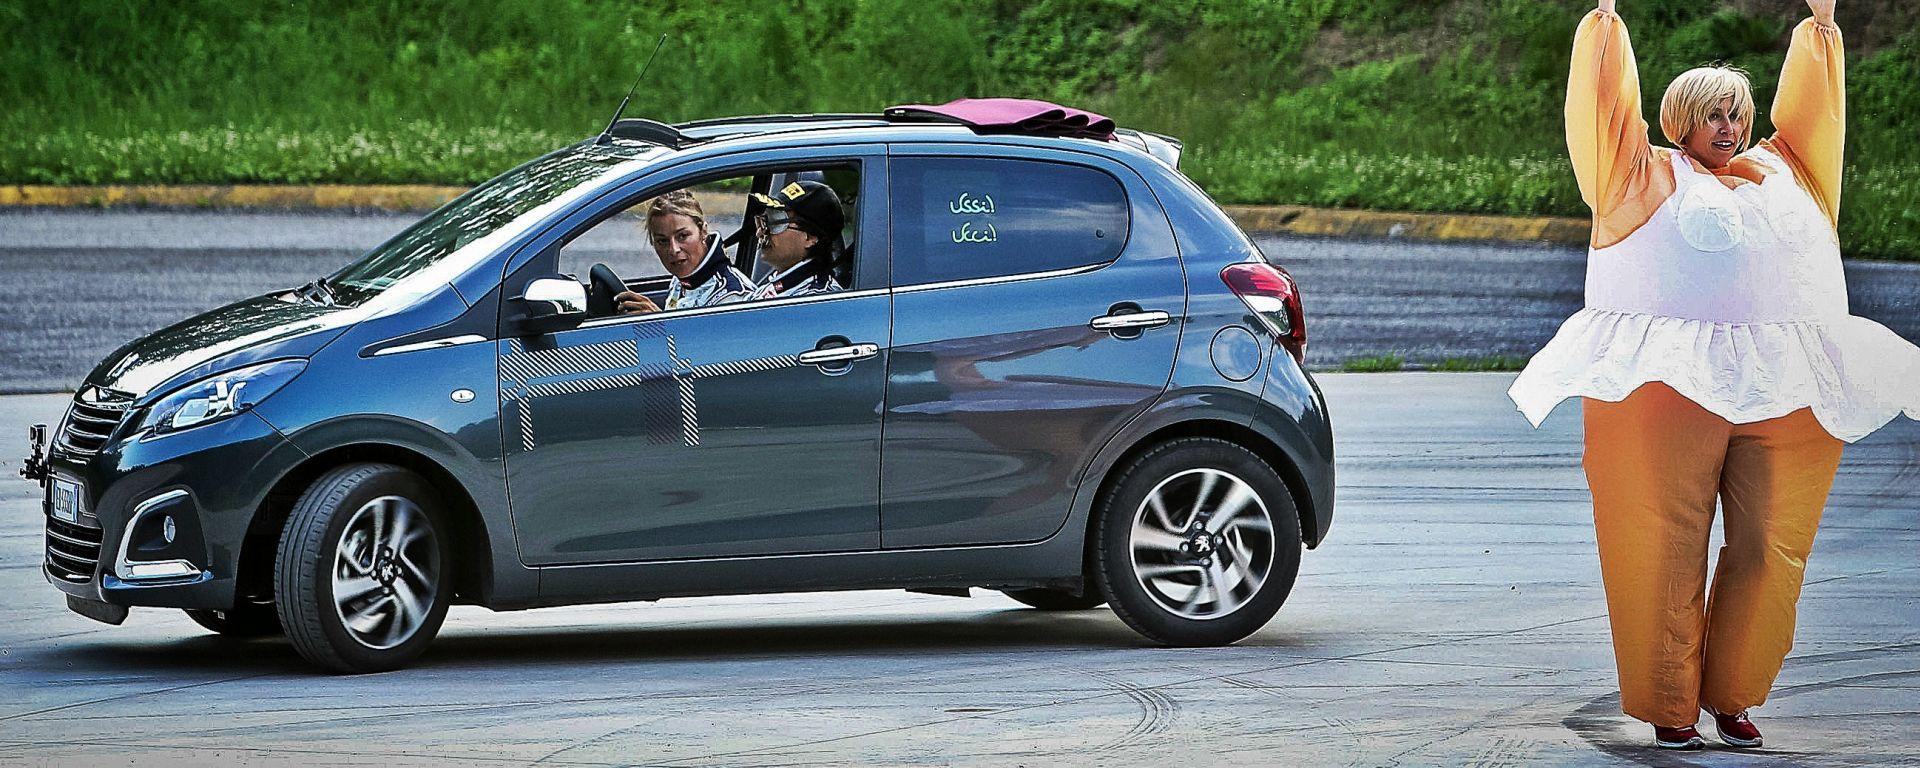 Peugeot 108 e Andreucci in pista alla cieca